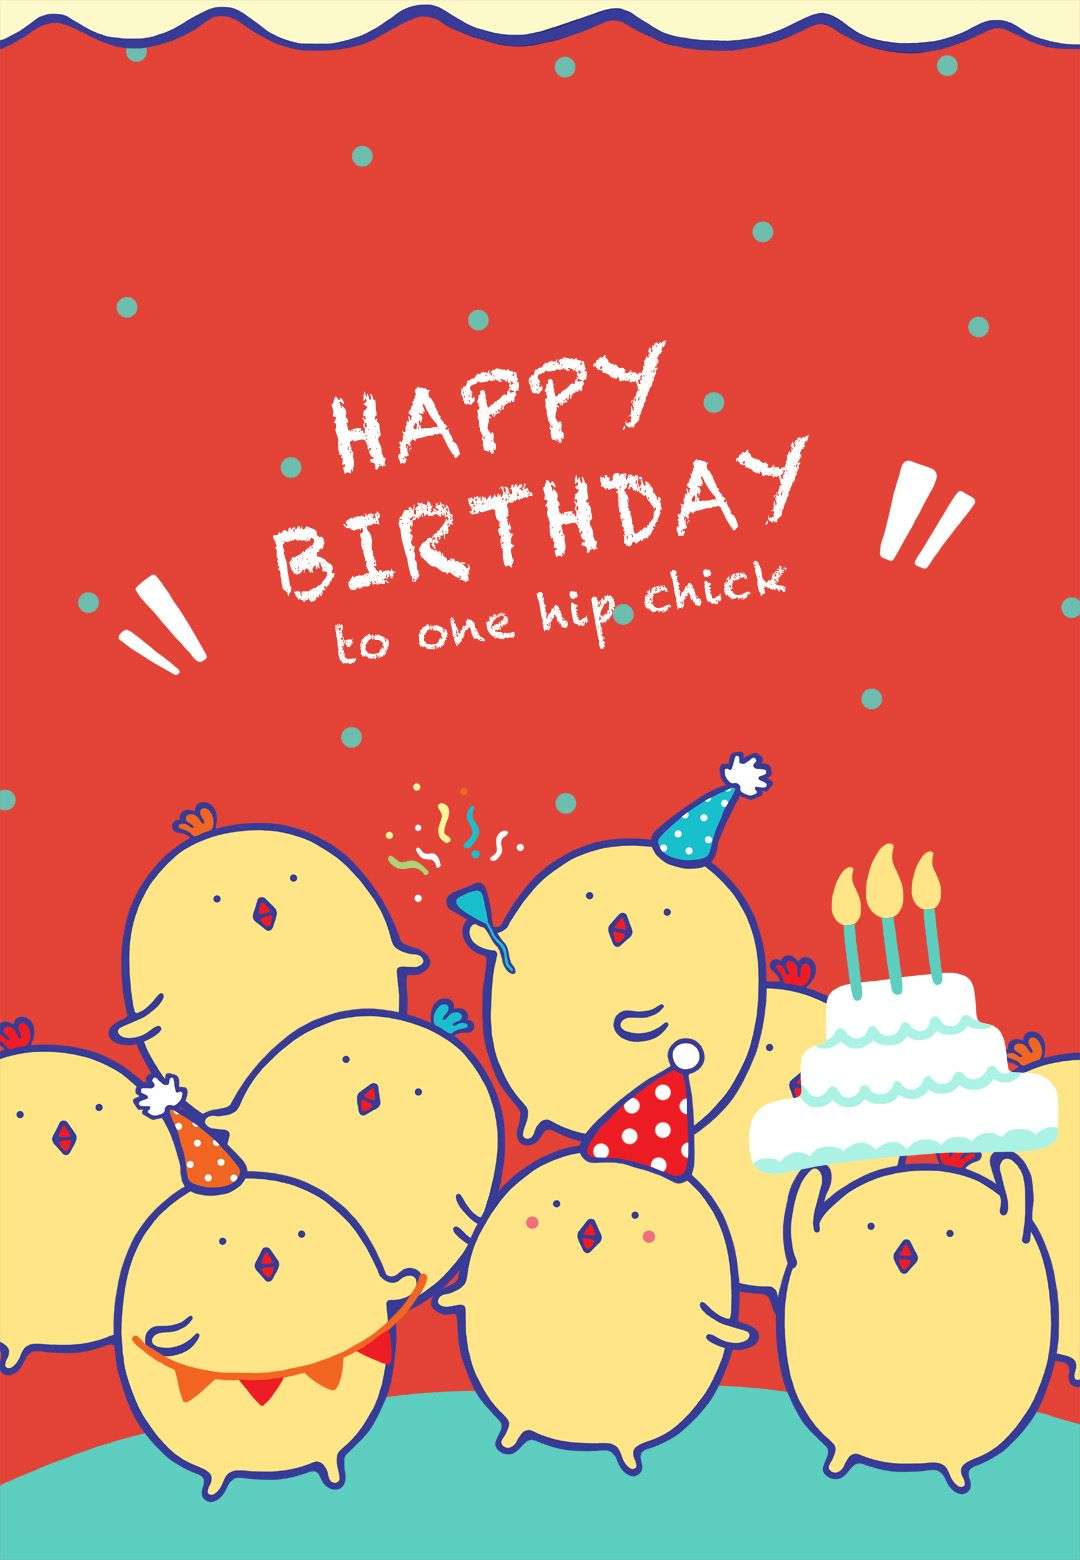 Birthday Card Free Printable One Hip Chick Greeting Card Stylish